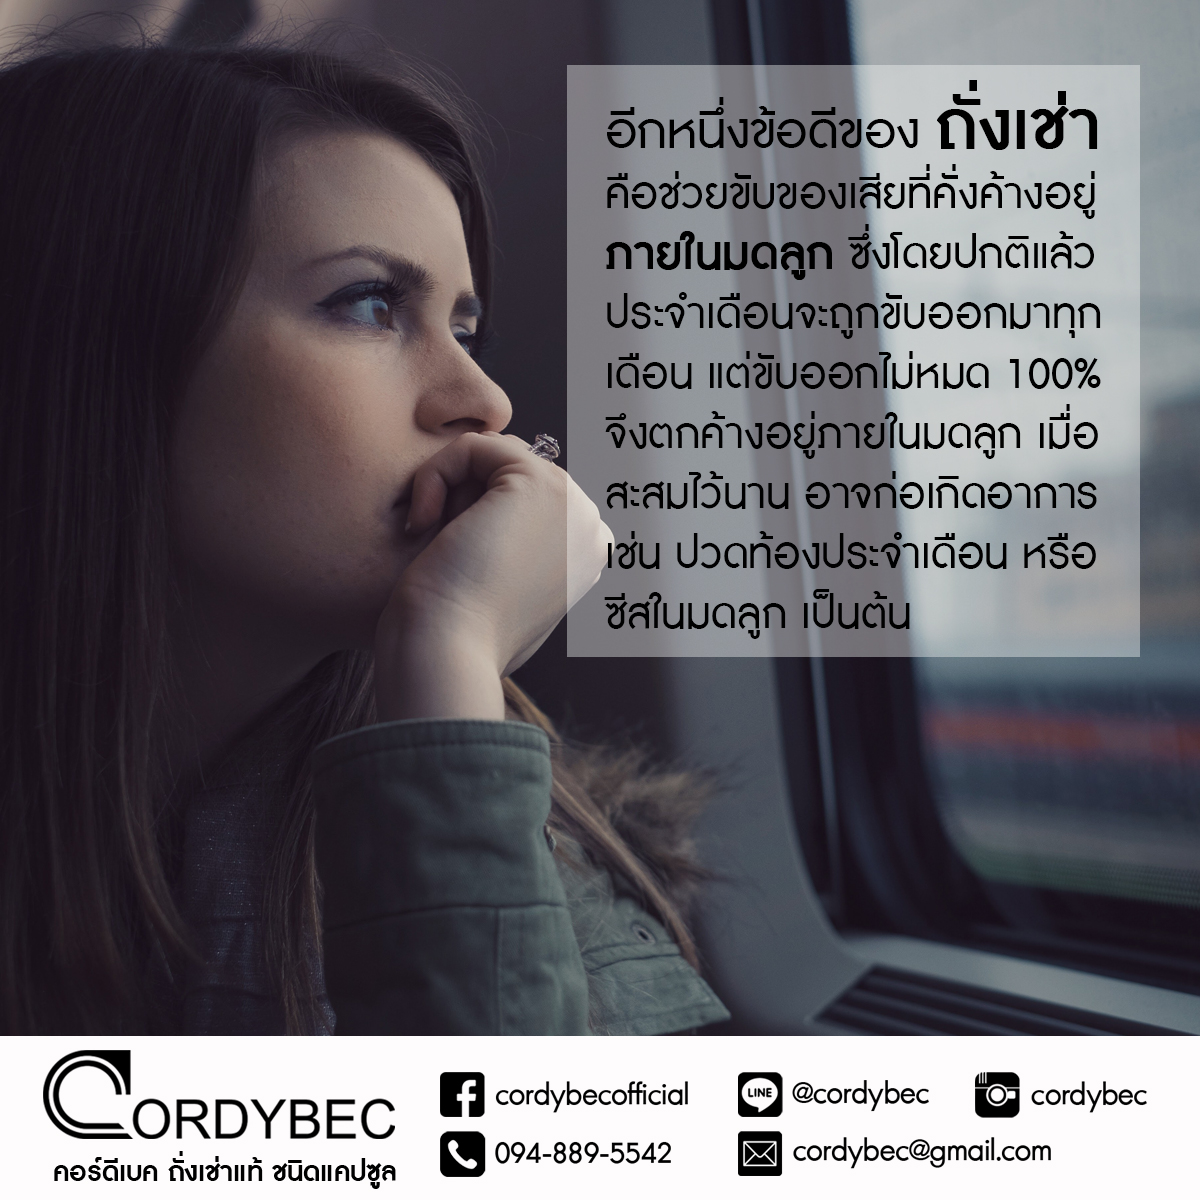 Cordybec women 021